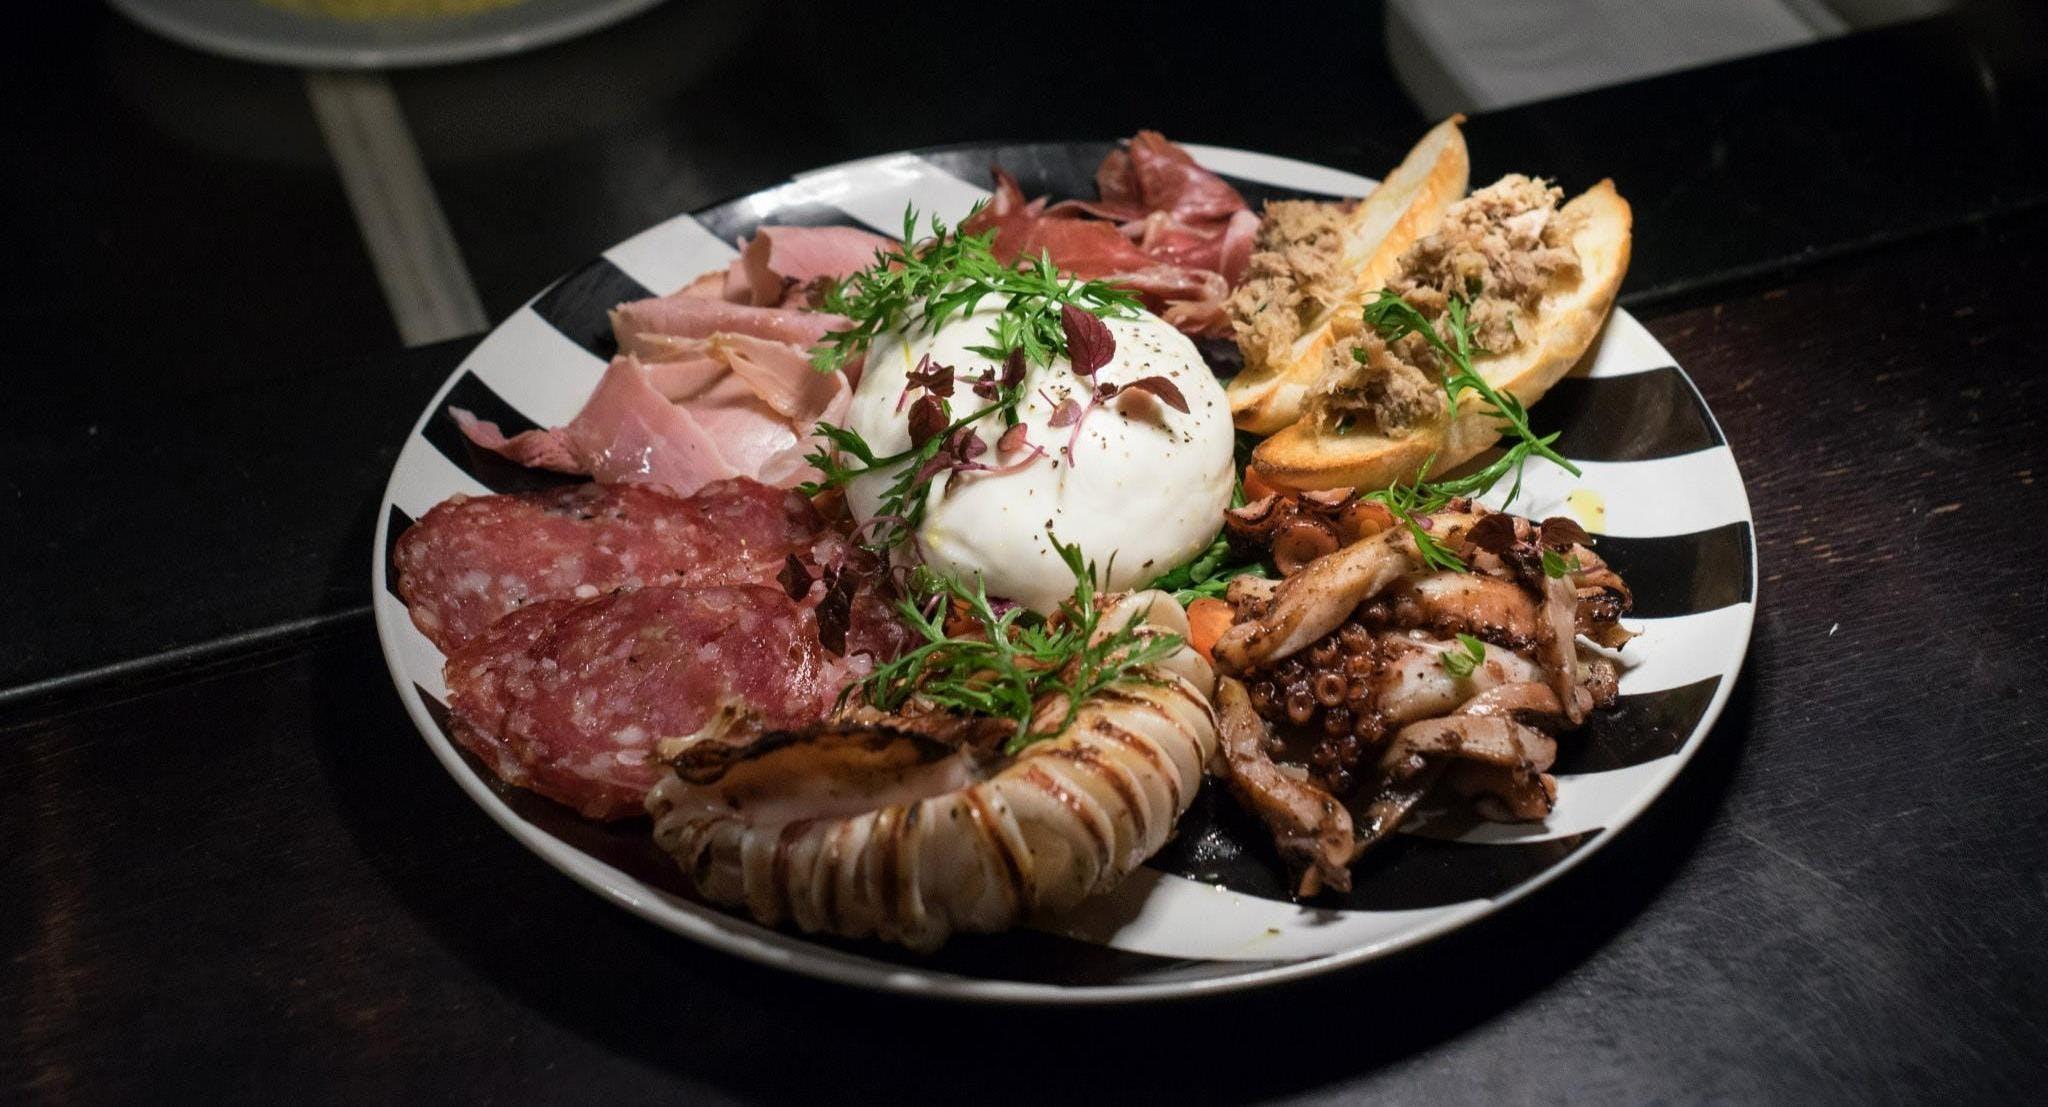 RUBATO Italian Kitchen & Bar